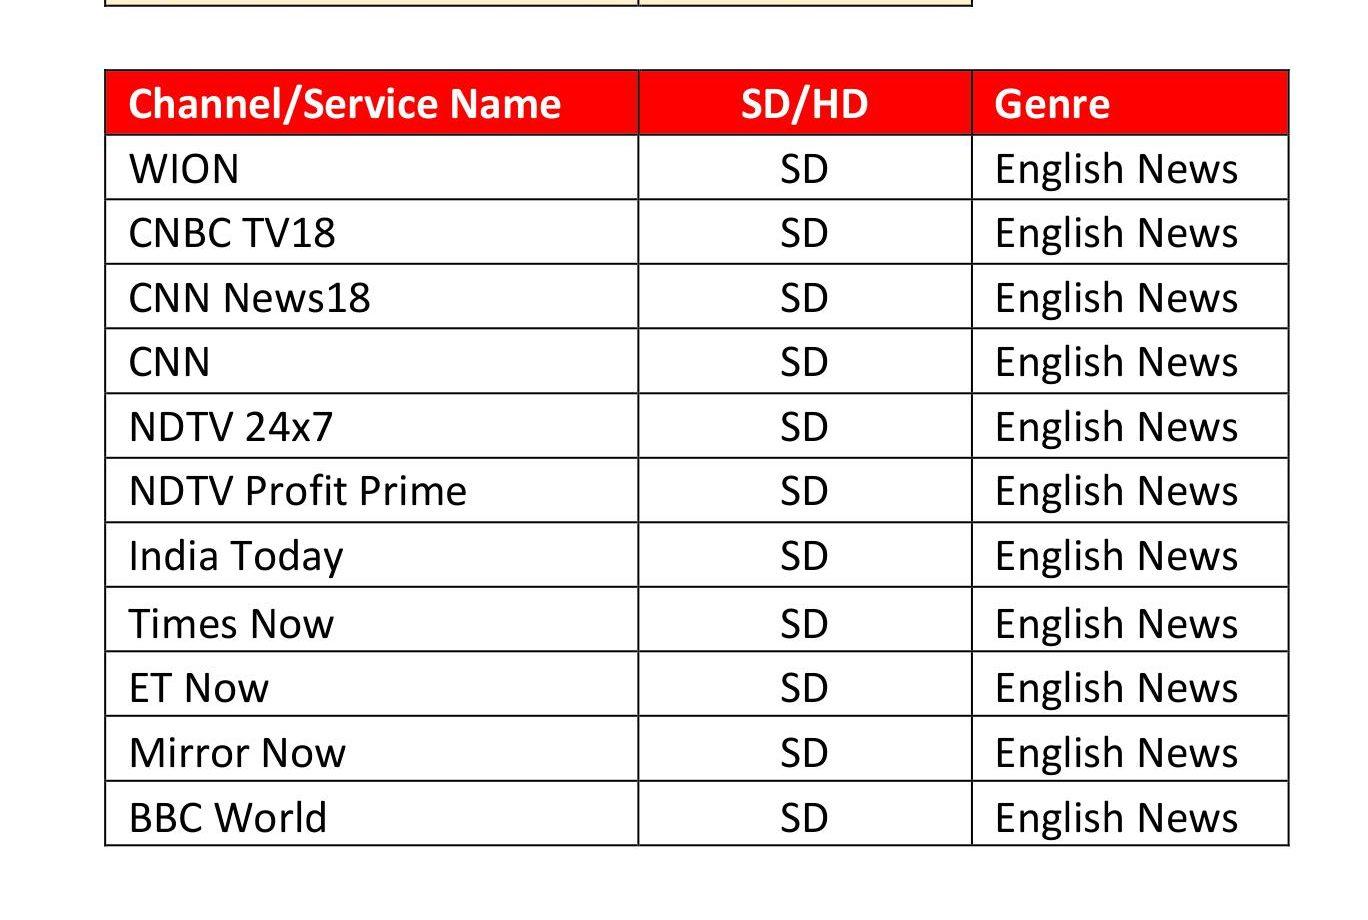 EnglishNews